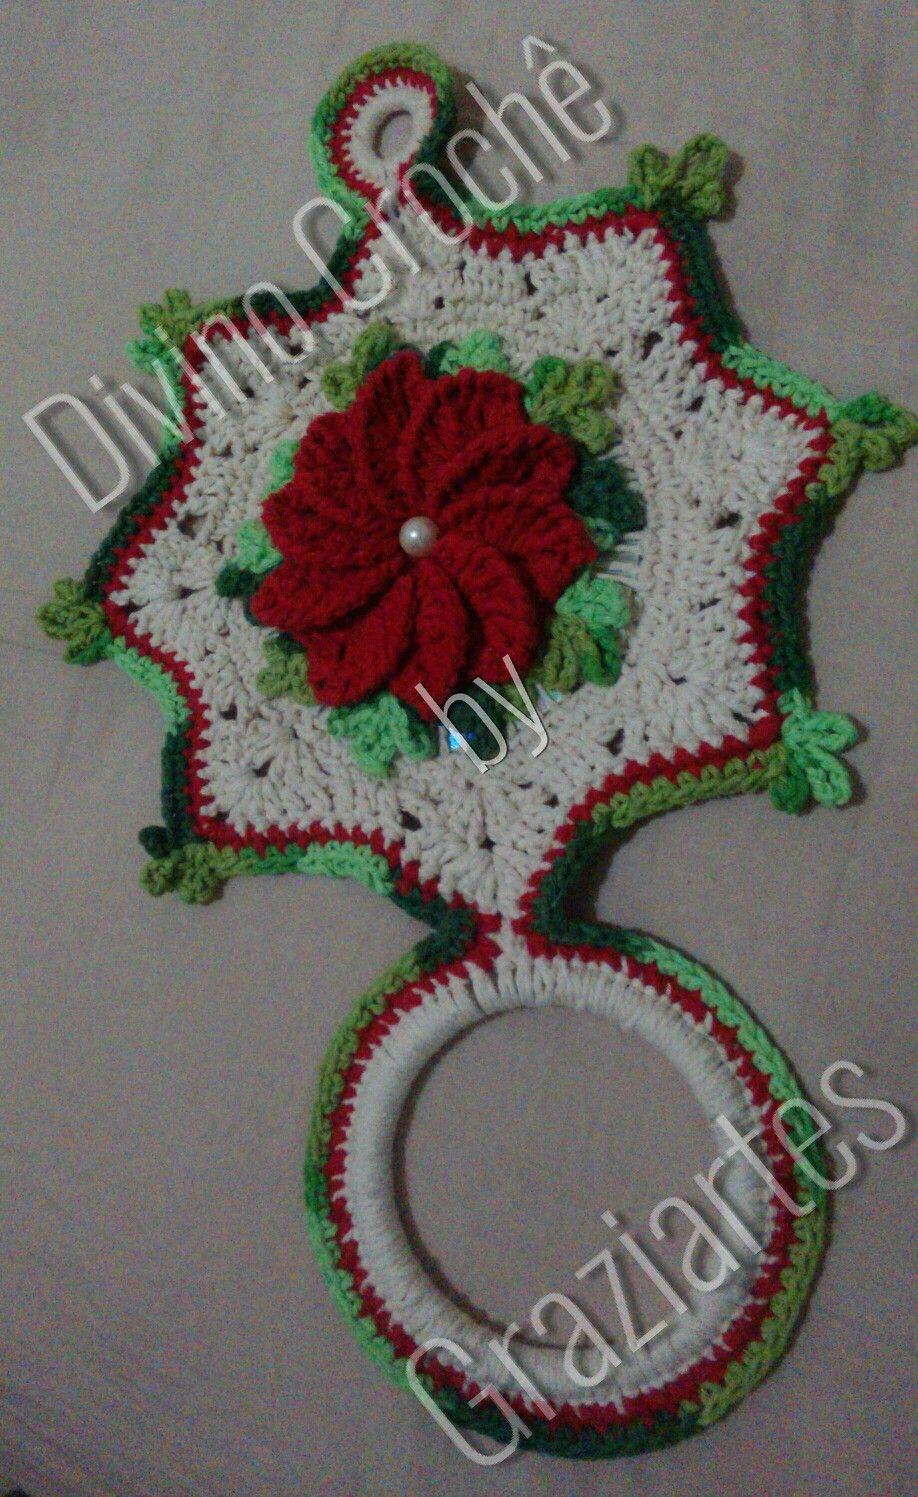 Porta pano de prato com cd | Crochet Casa | Pinterest | Cosas de ...